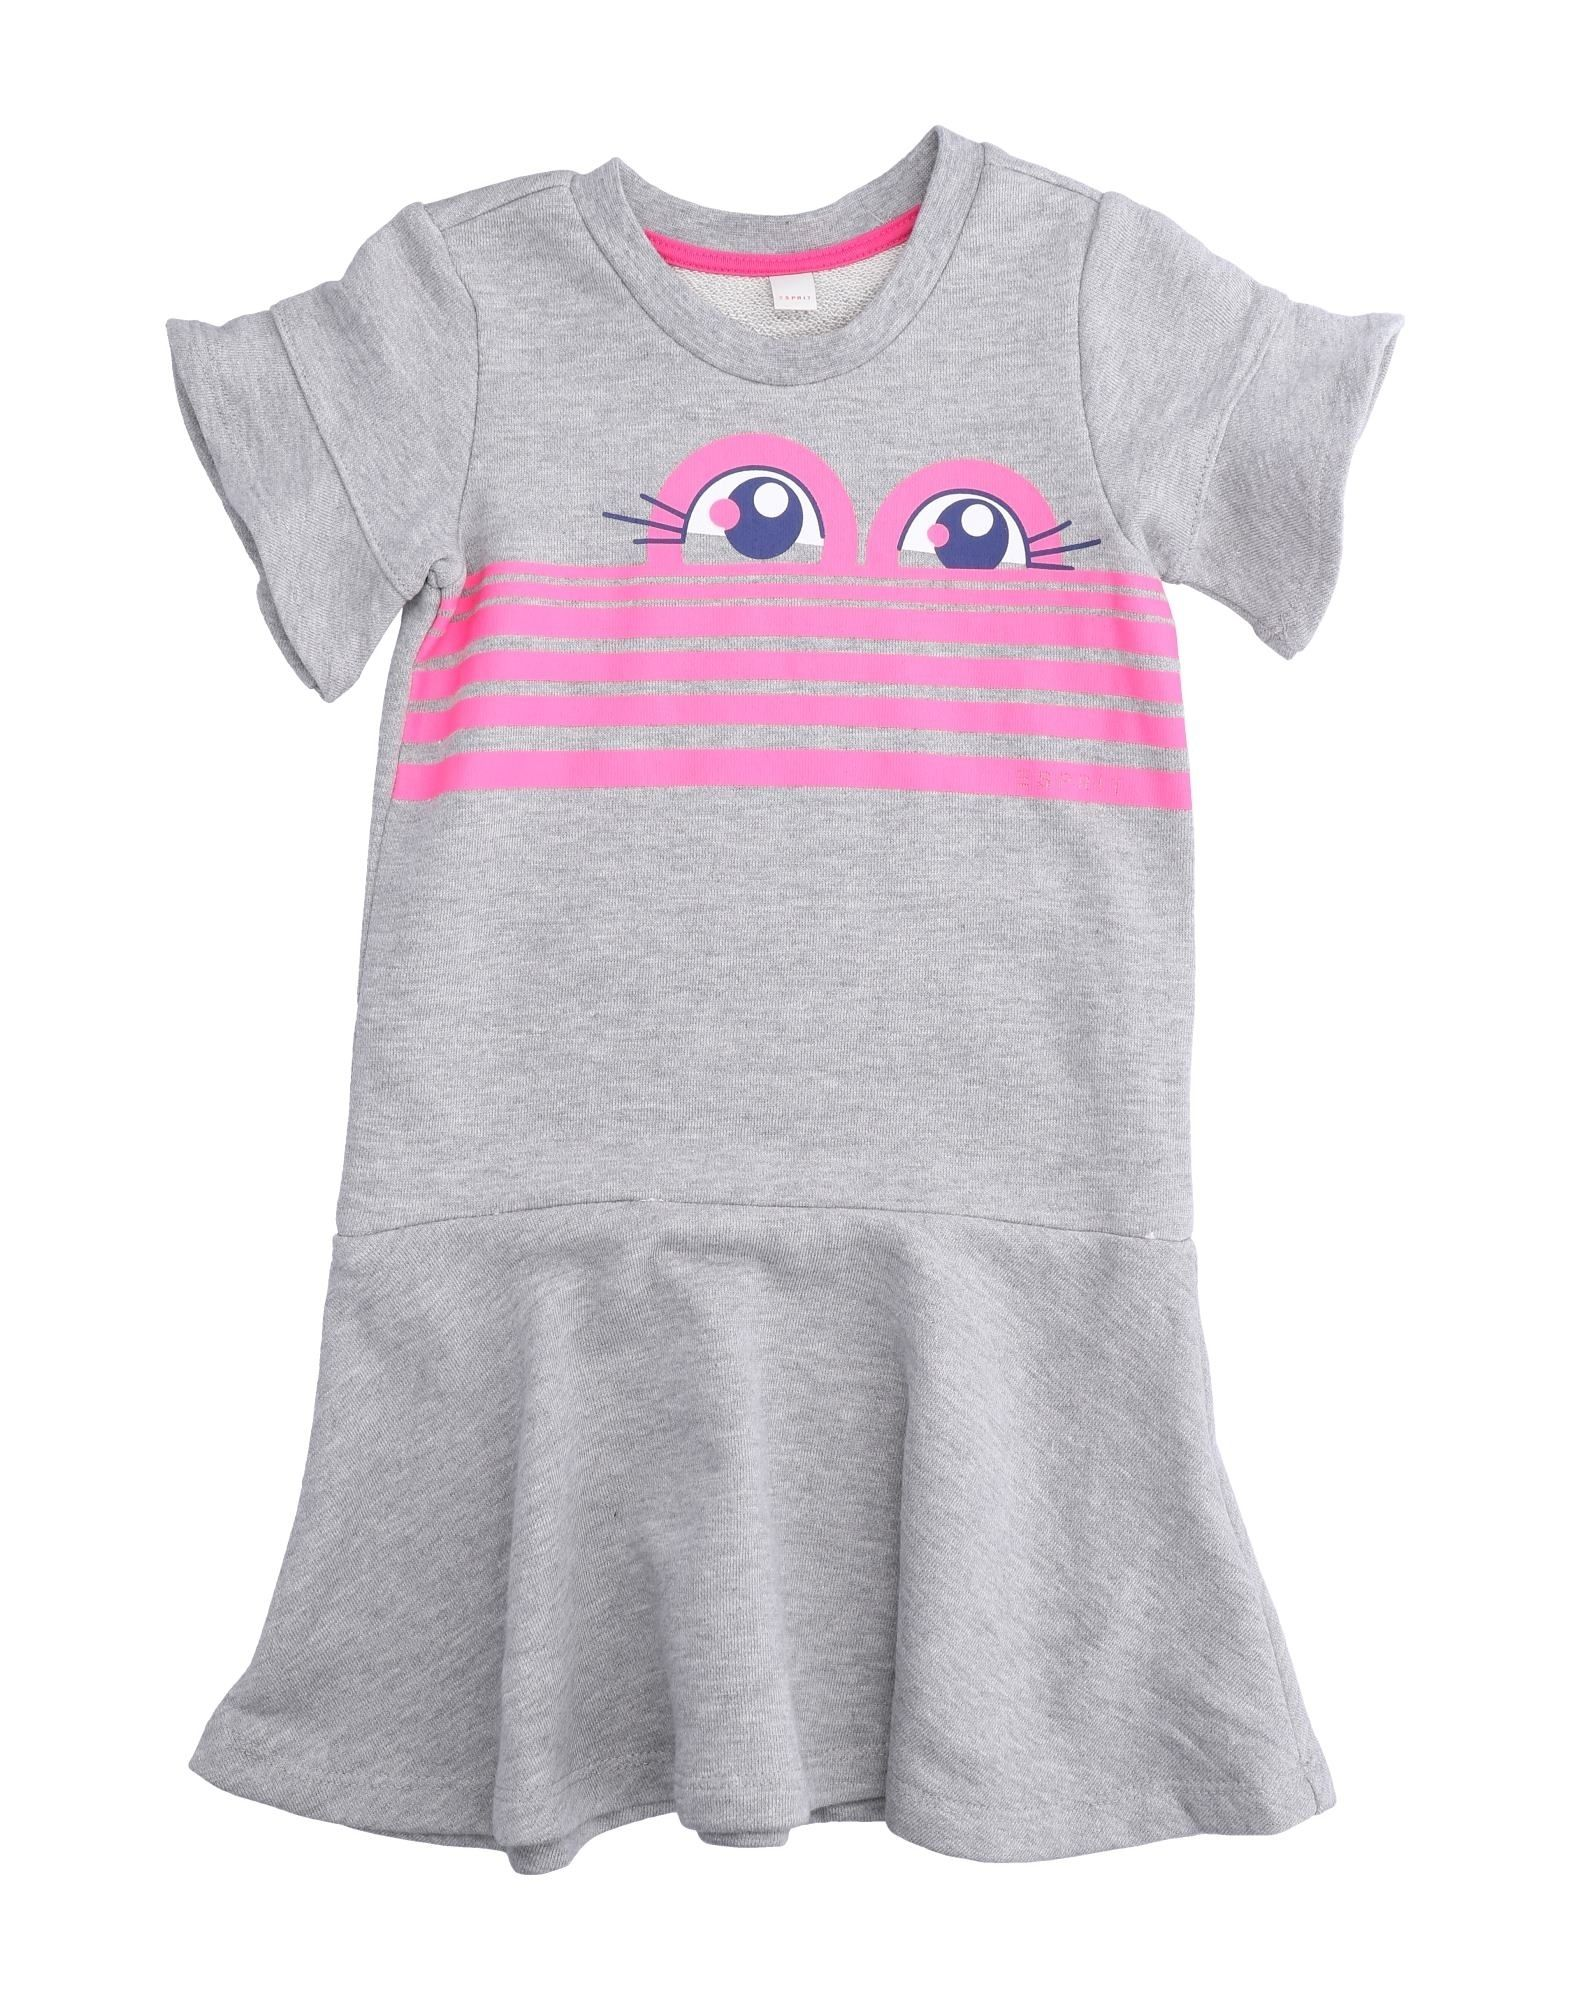 ESPRIT Baby Girls Sweatshirt